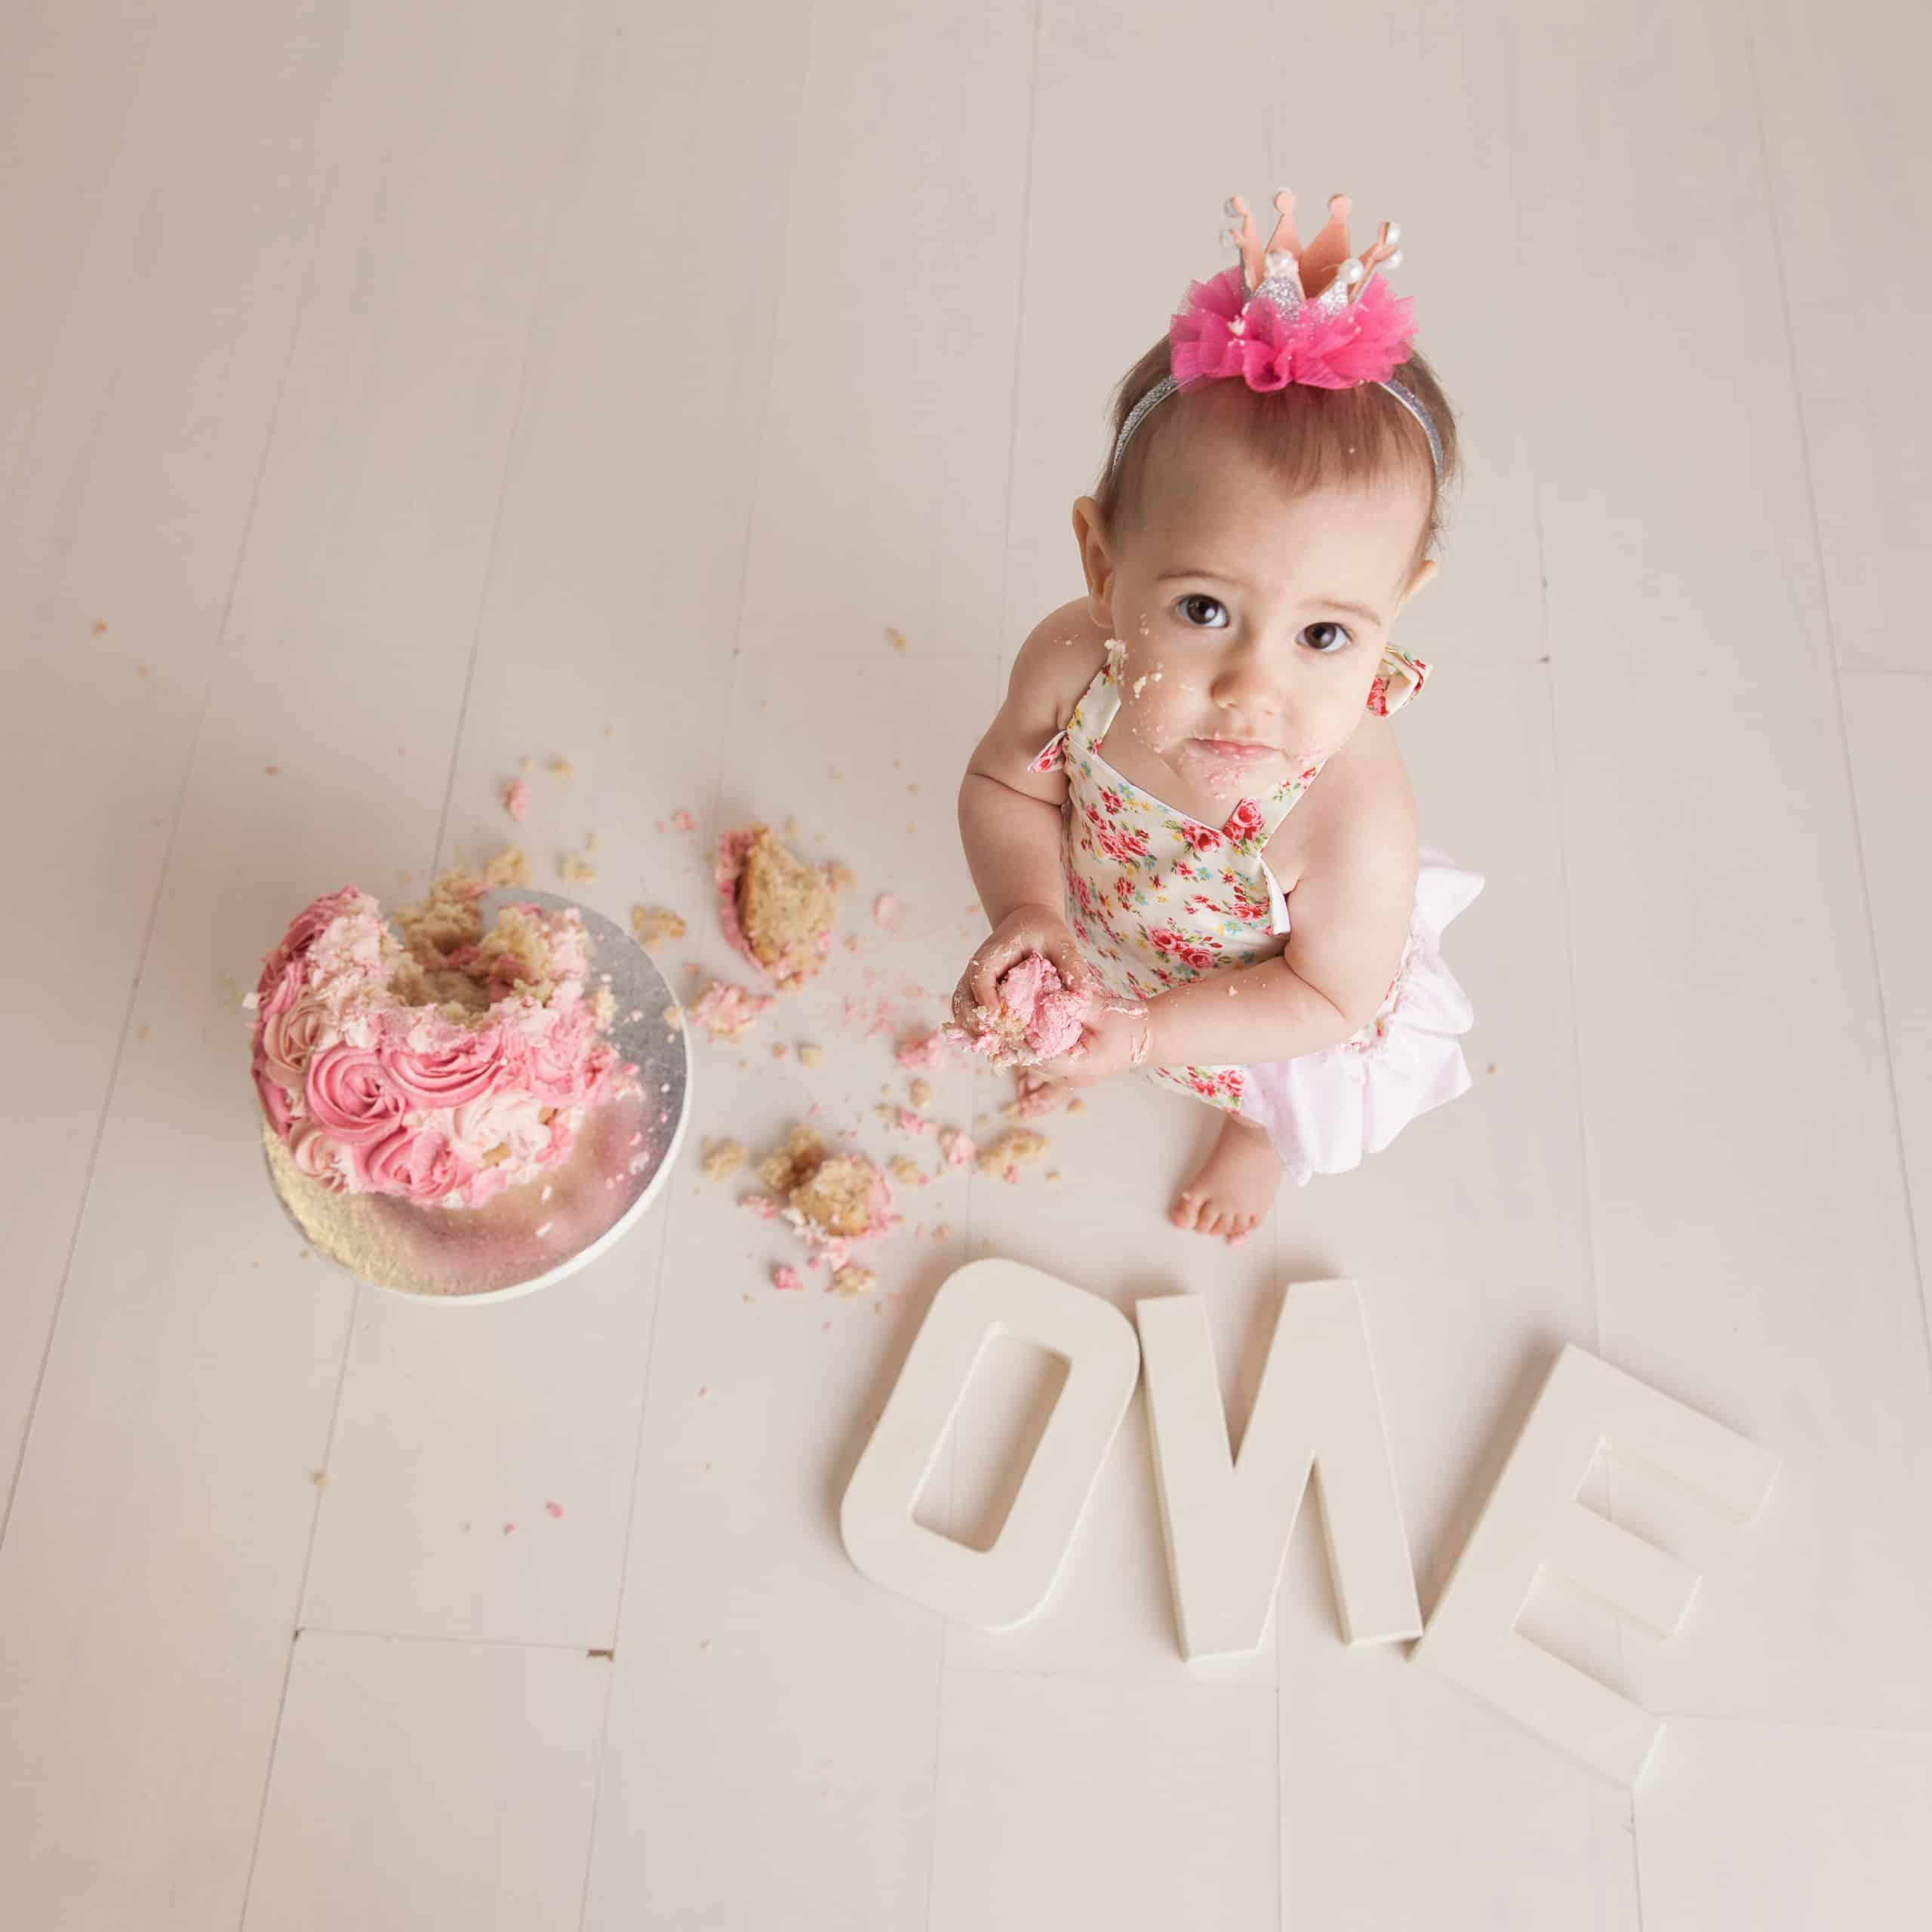 First Birthday Cake Smash Photography | Sophia-Belle 39